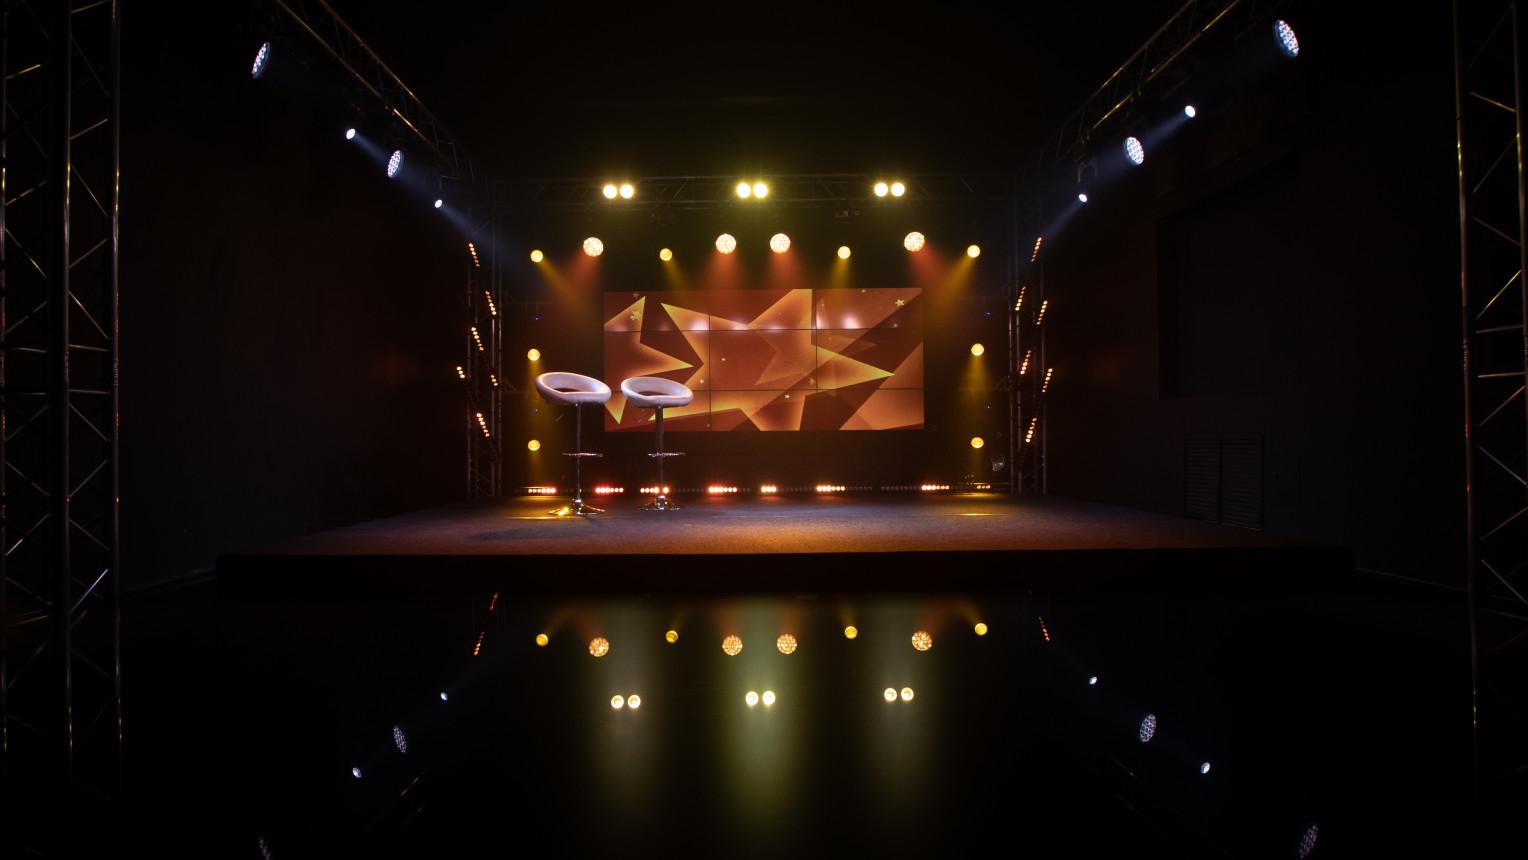 J-Sound концертный зал - фото №2